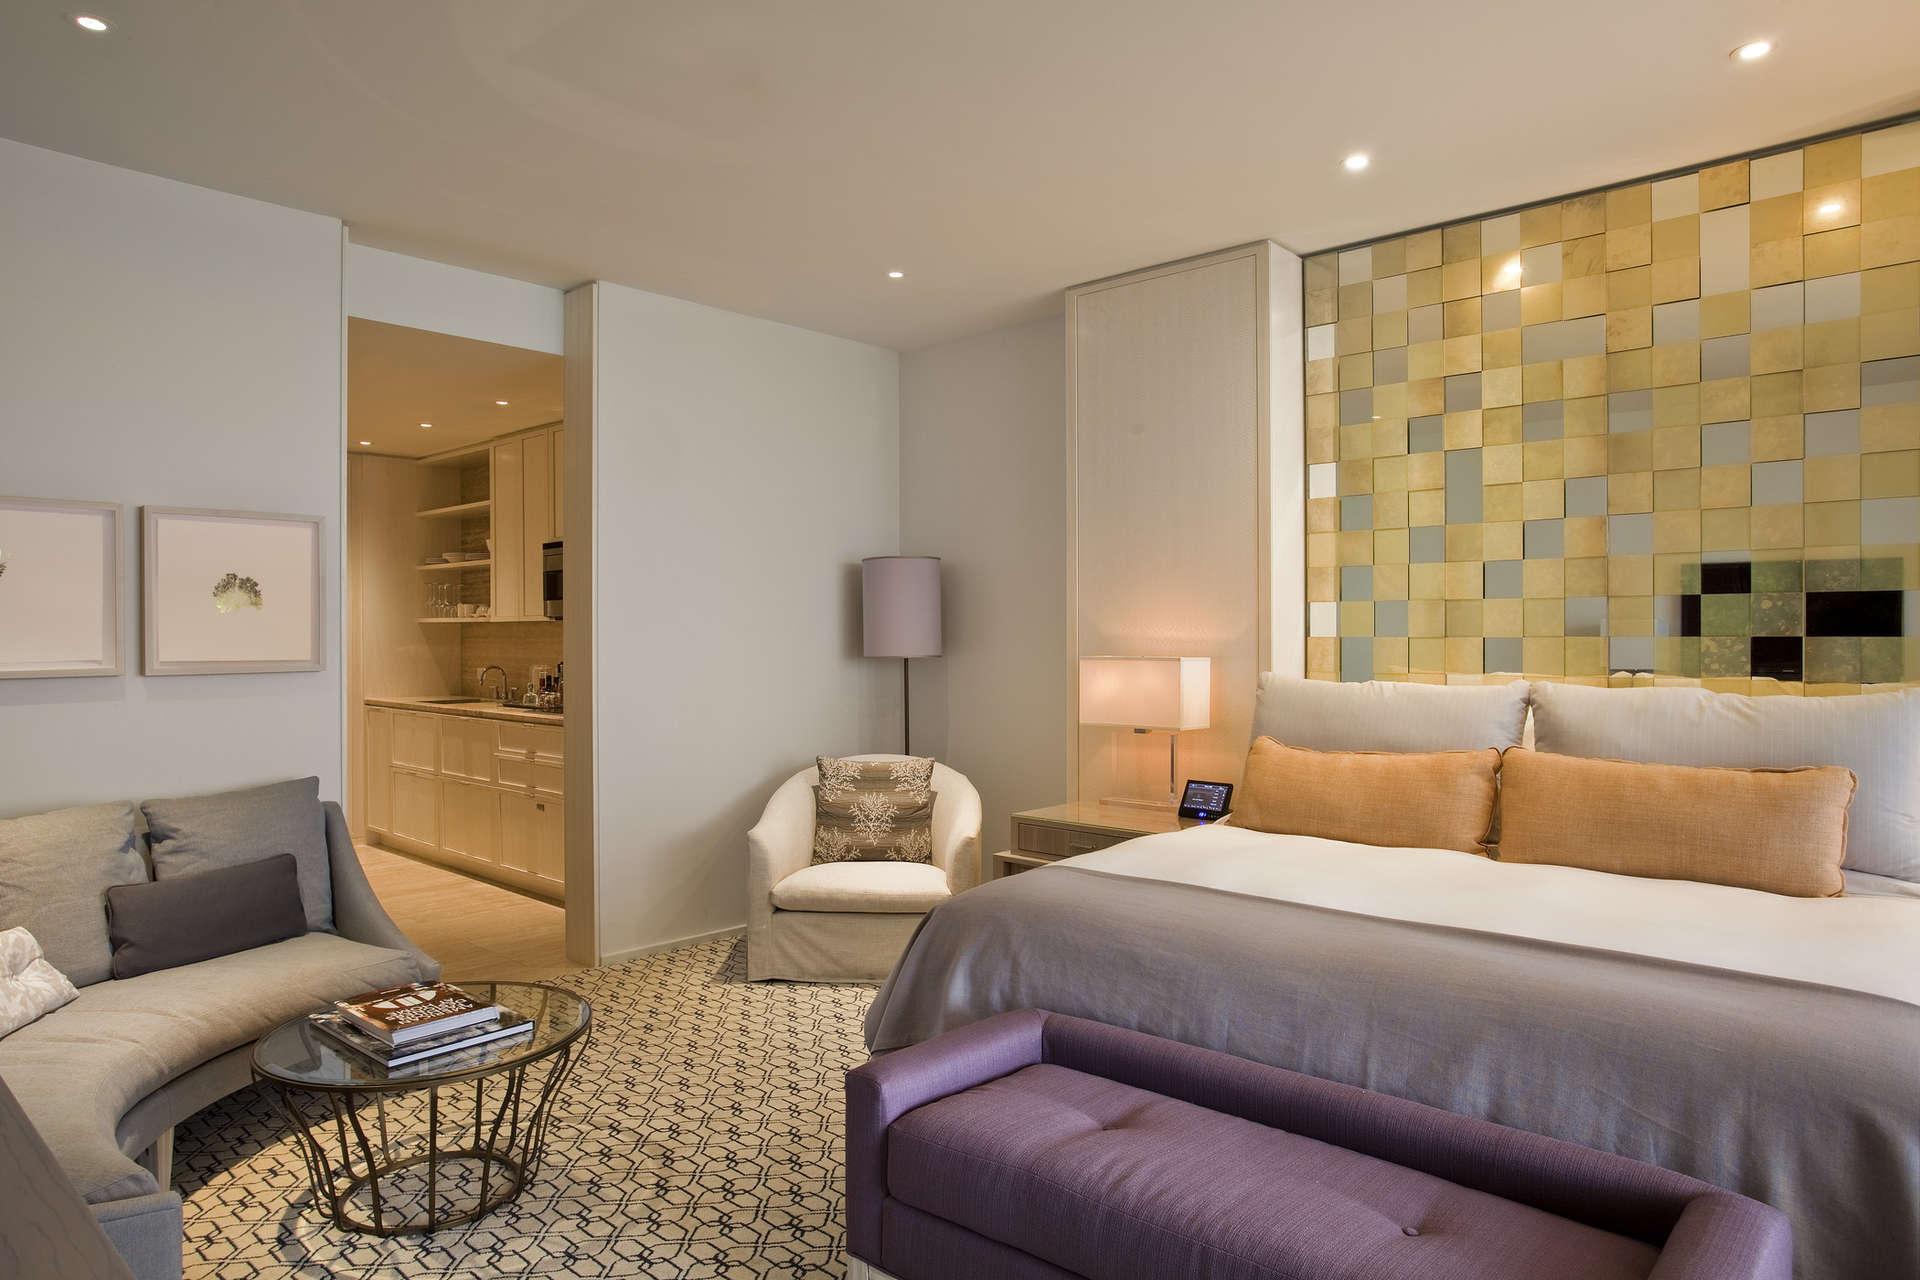 Luxury vacation rentals usa - Florida - Miami beach - St regisbalharbourresort  - Astor Junior Studio Suite - Image 1/9